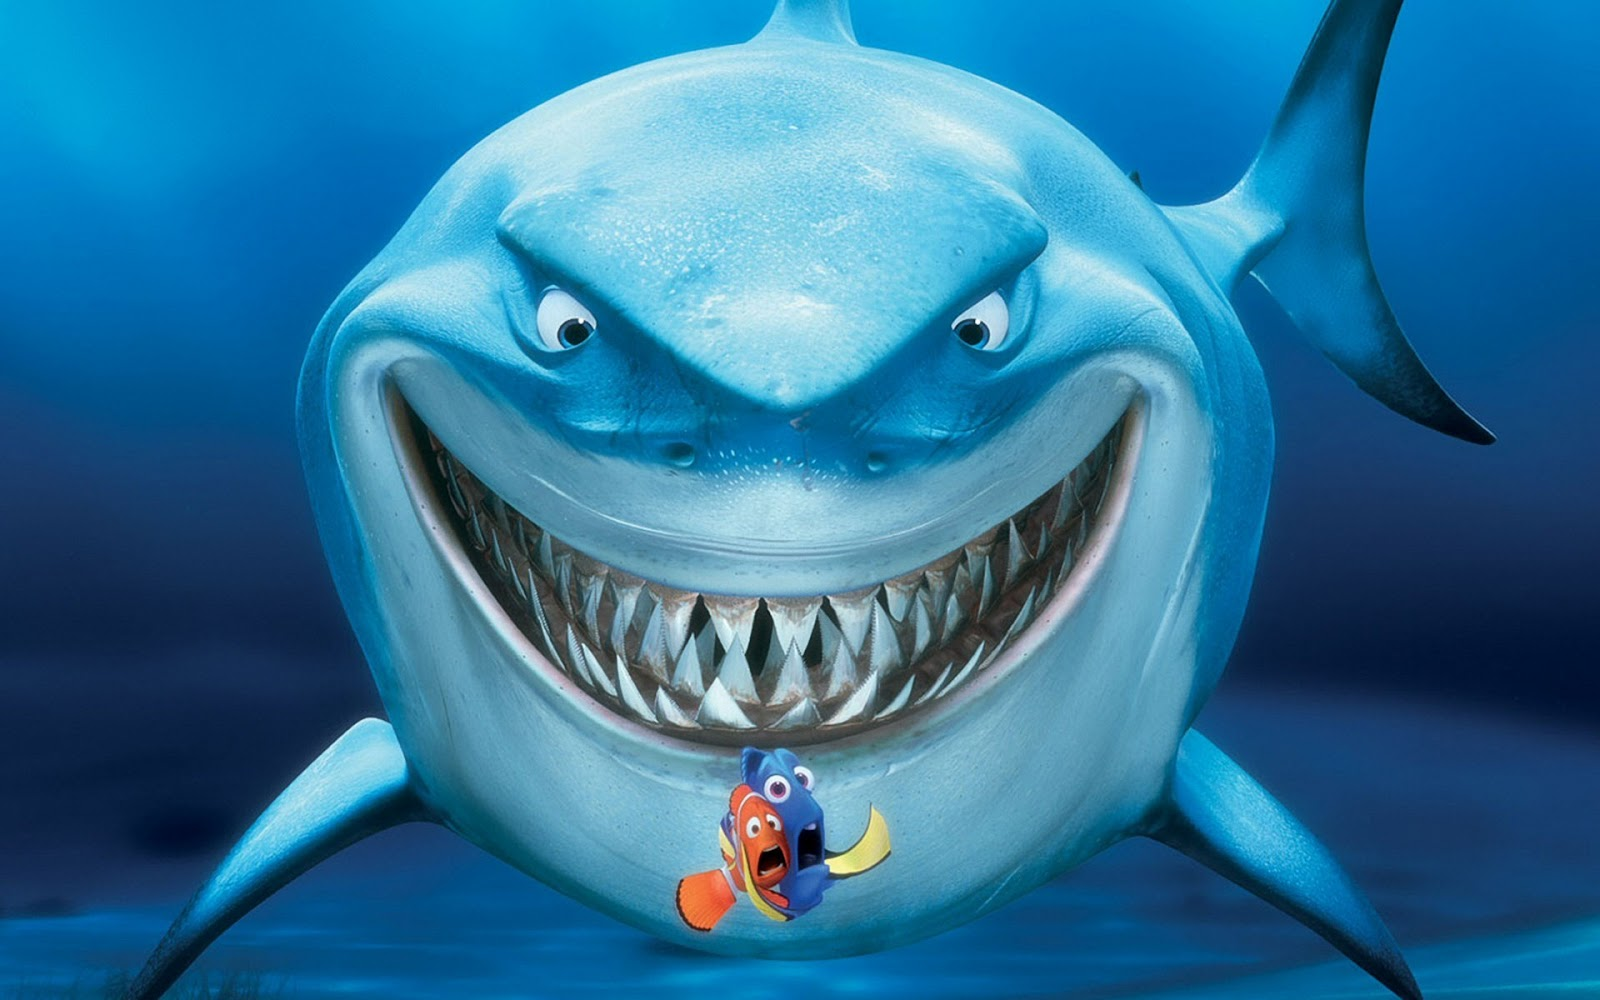 Shark hd wallpapers | Movies Songs Lyrics